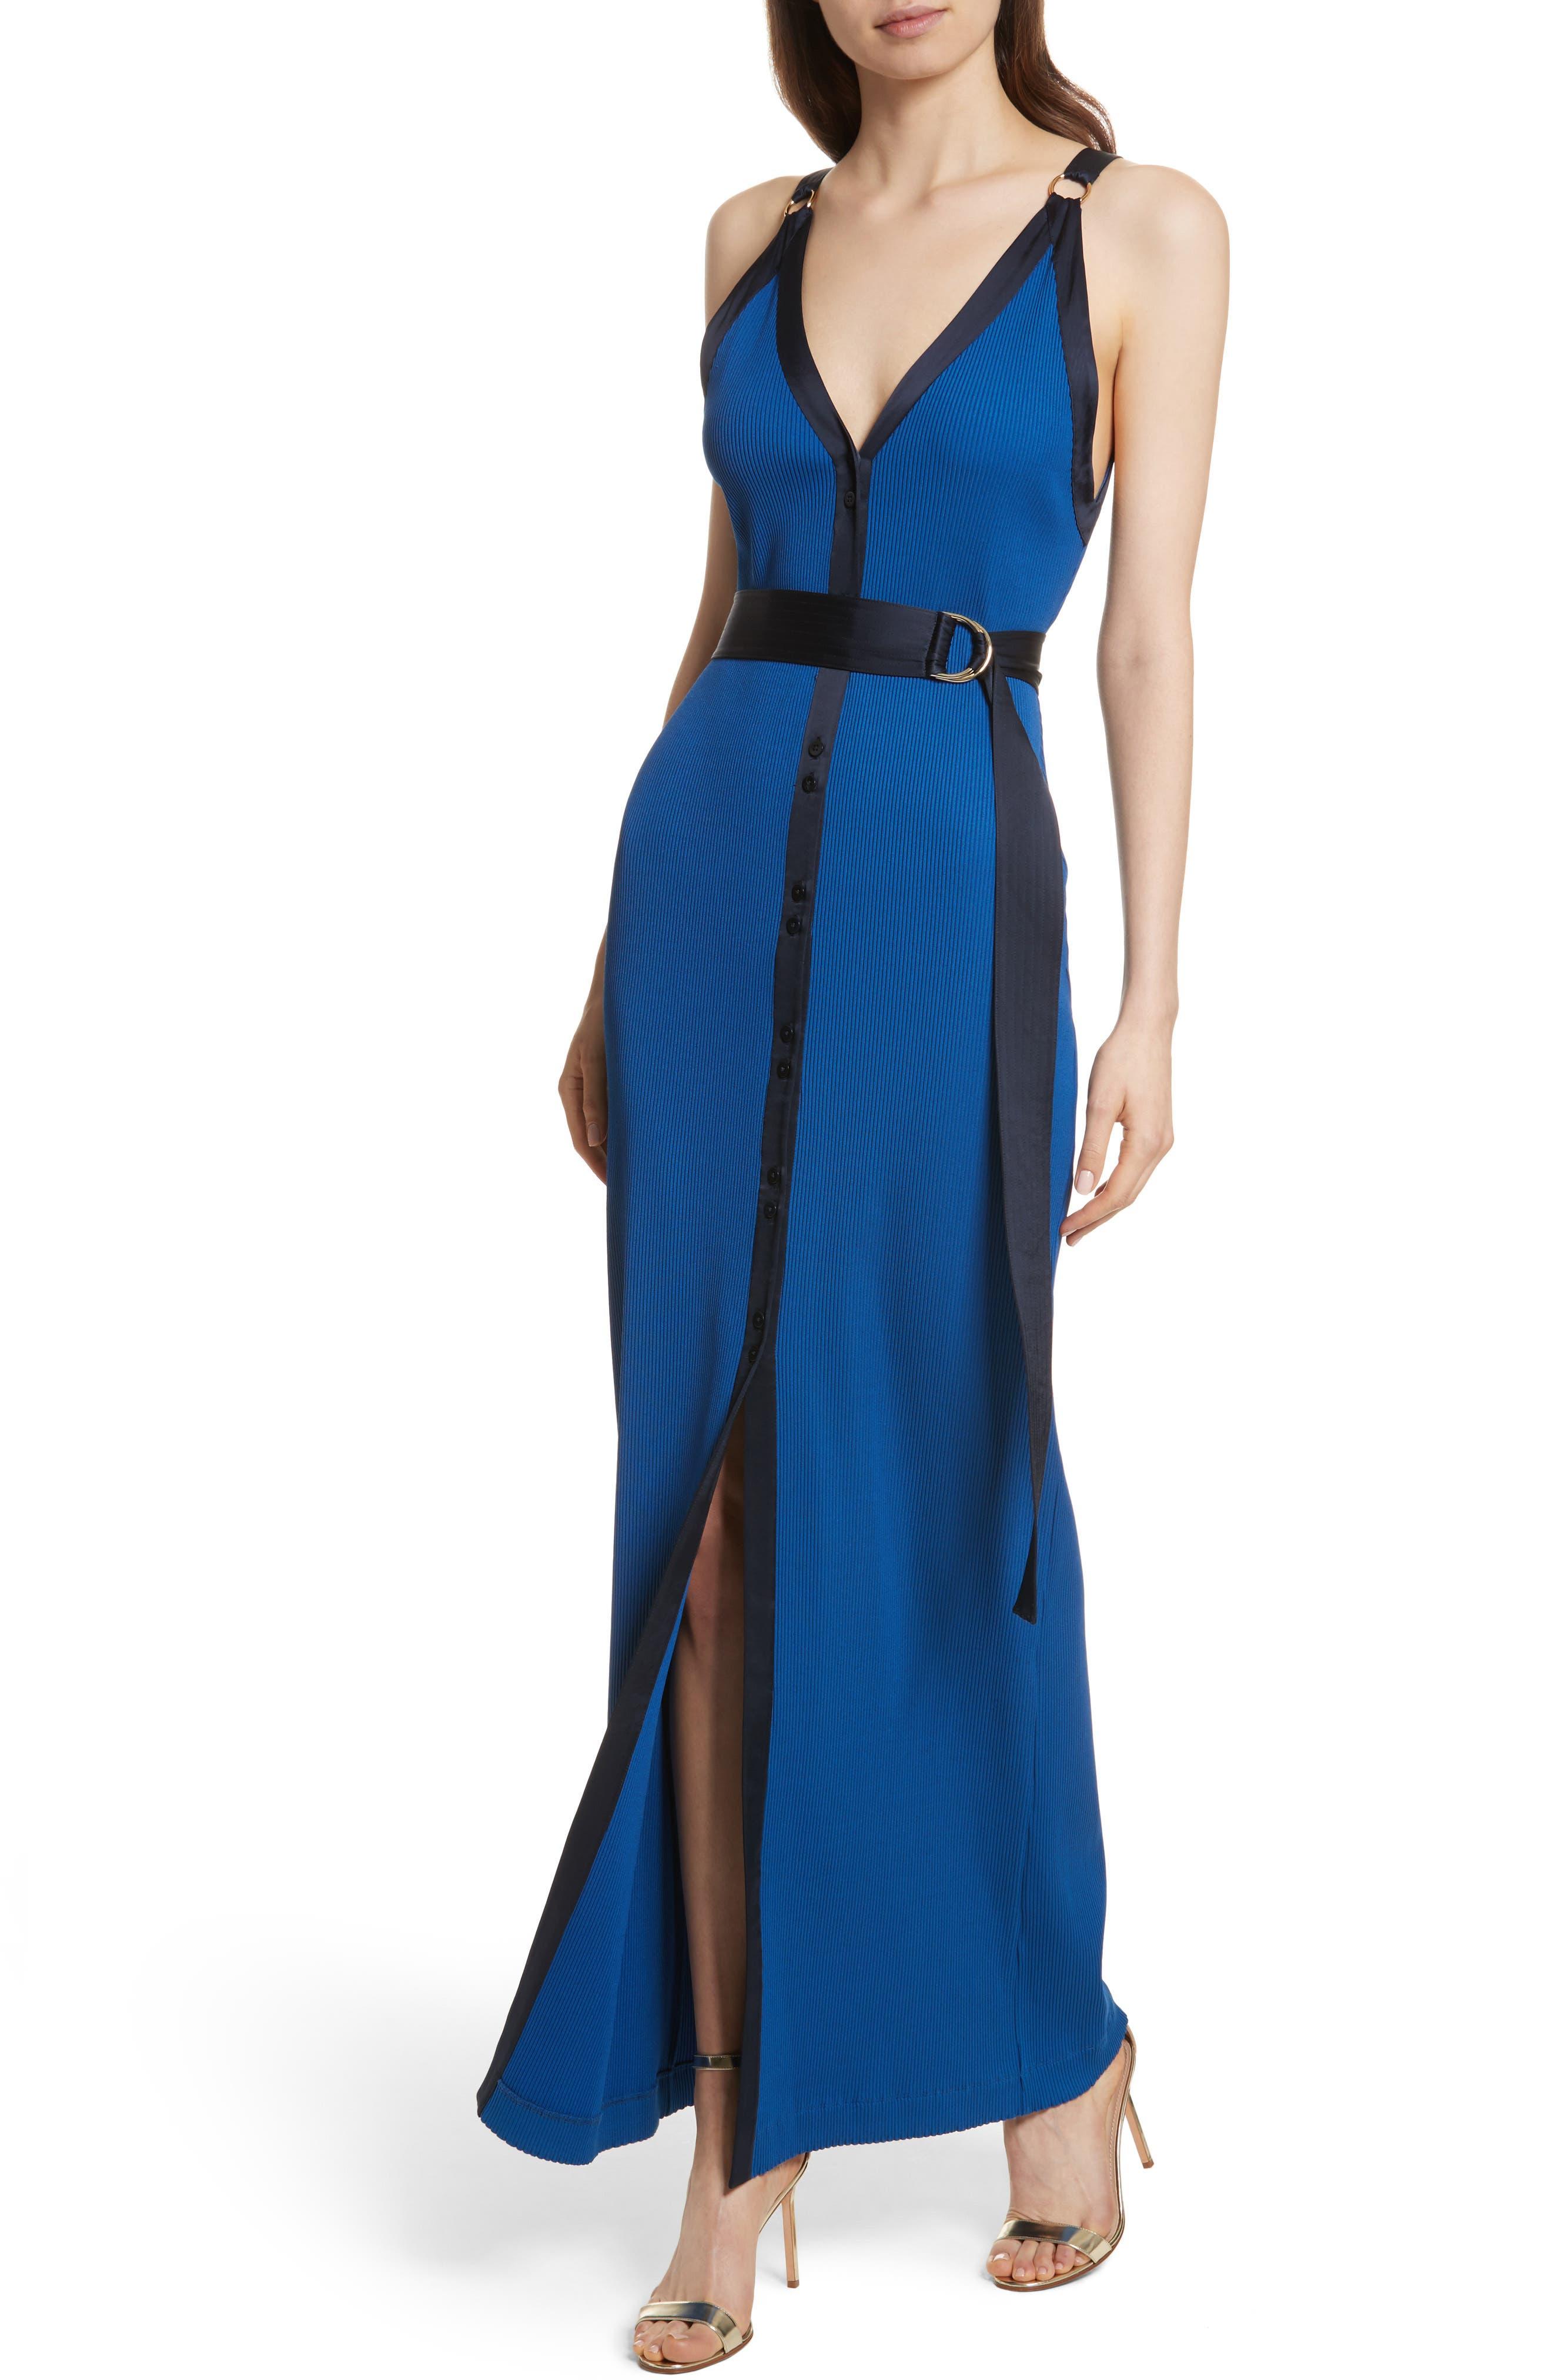 Diane von Furstenberg Ribbed Jersey Maxi Dress,                             Alternate thumbnail 4, color,                             412